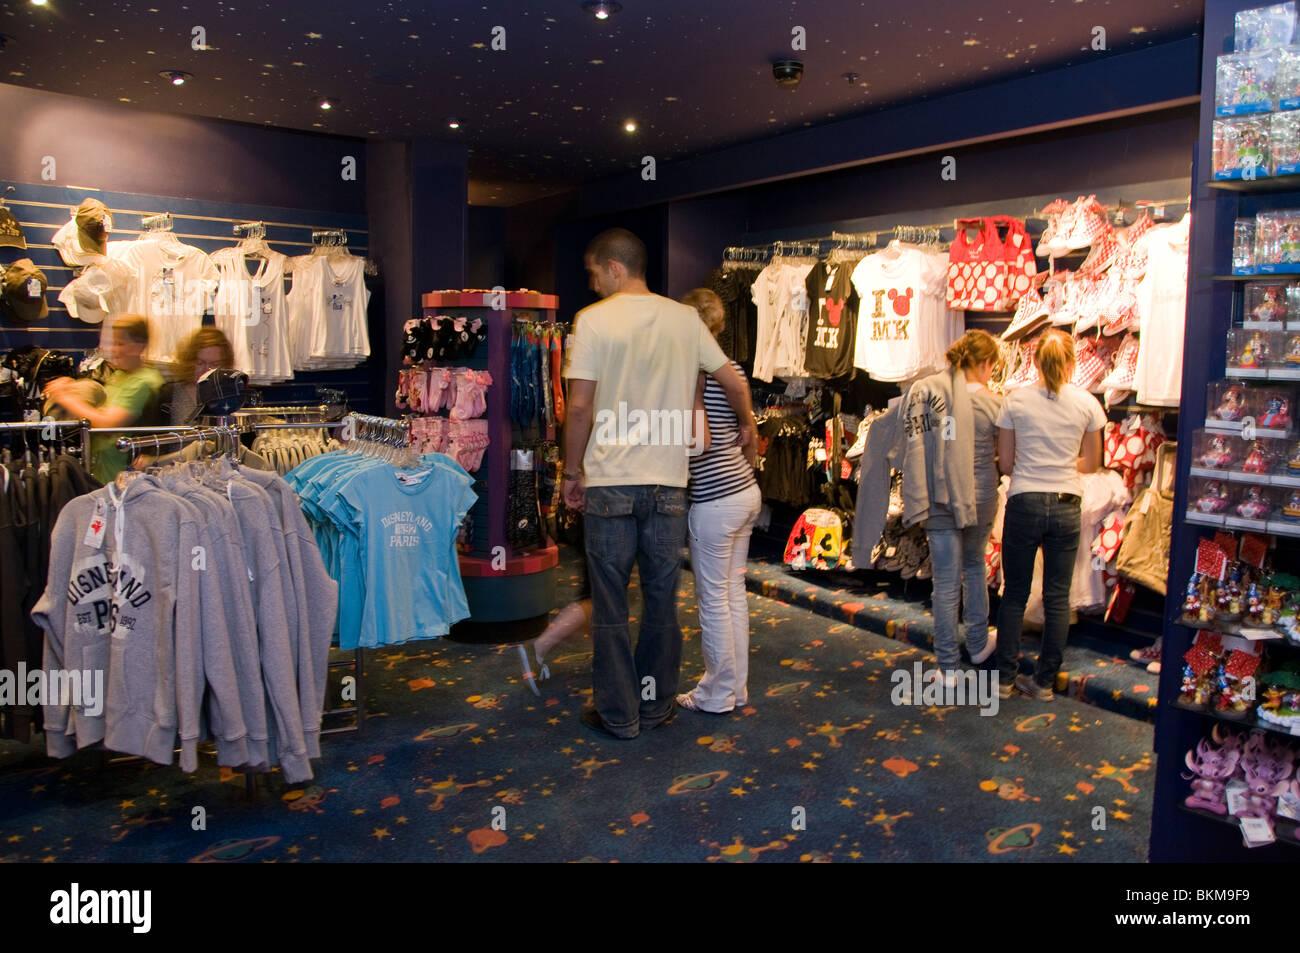 Paris, France, Theme Parks, Tourists Visiting Disneyland Paris, Shopping in Clothing Stores - Stock Image